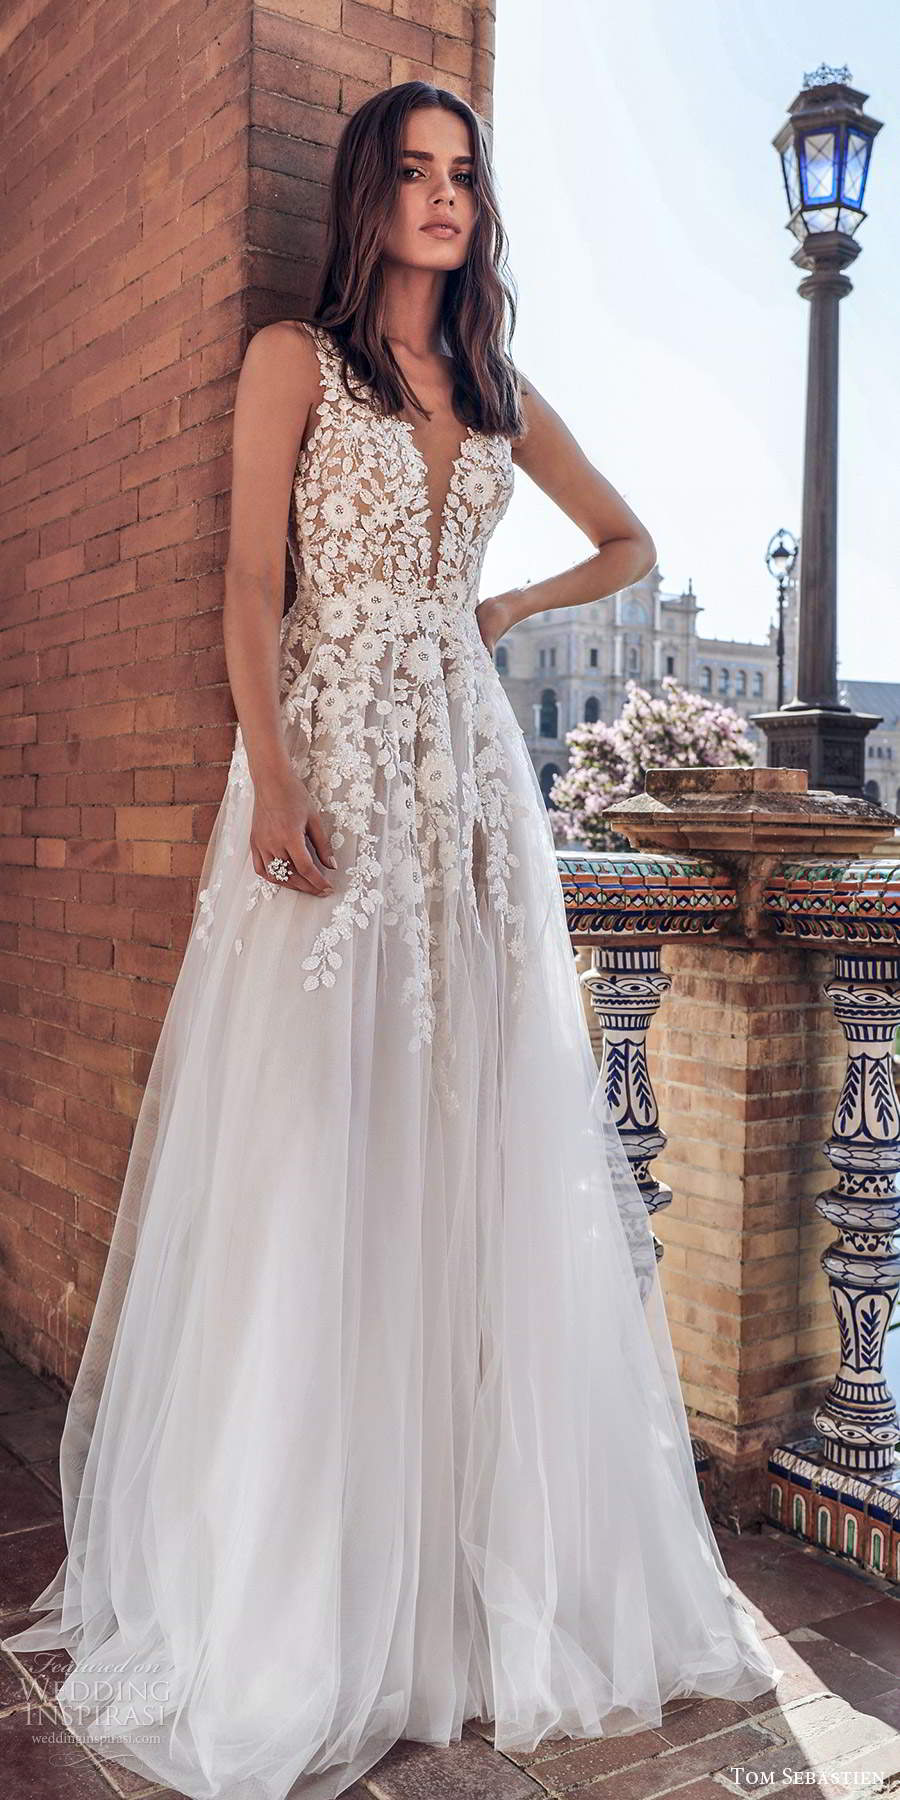 tom sebastien 2021 bridal sleeveless straps plunging v neckline heavily embellished bodice a line ball gown weddnig dress chapel train (15) mv